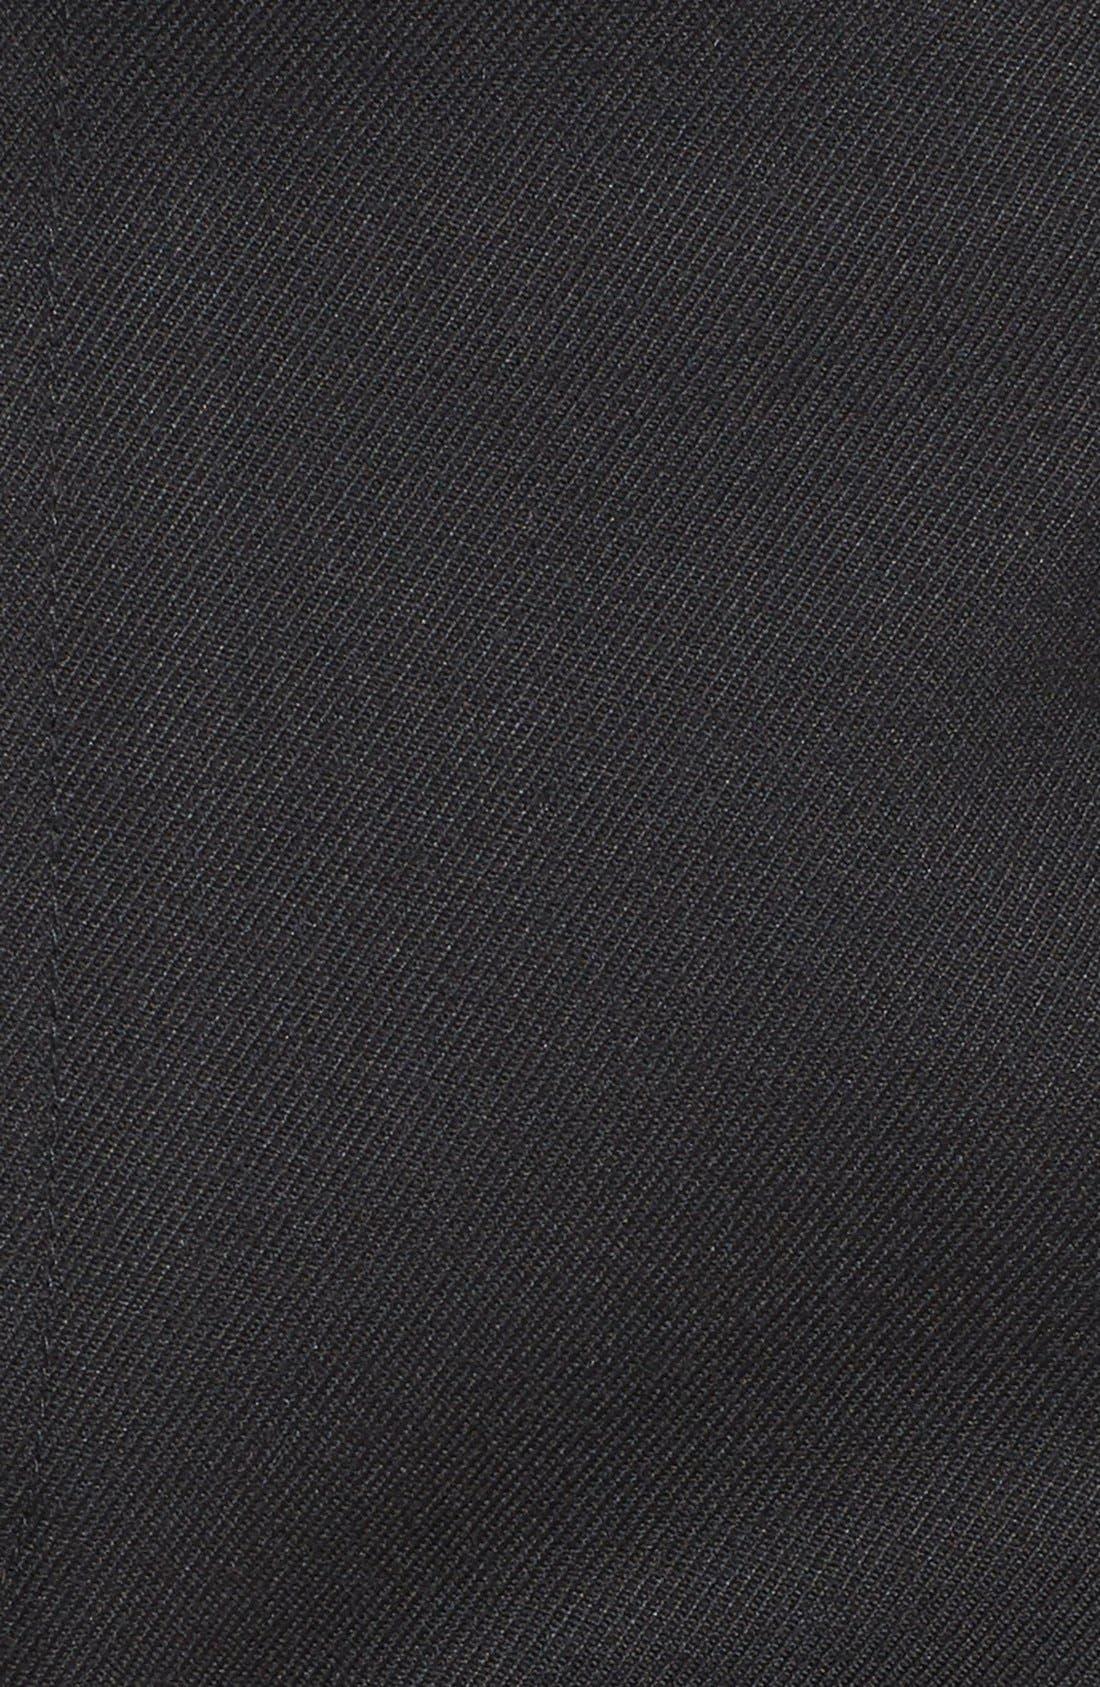 TOPMAN, Skinny Fit Cotton Flannel Trousers, Alternate thumbnail 4, color, 001